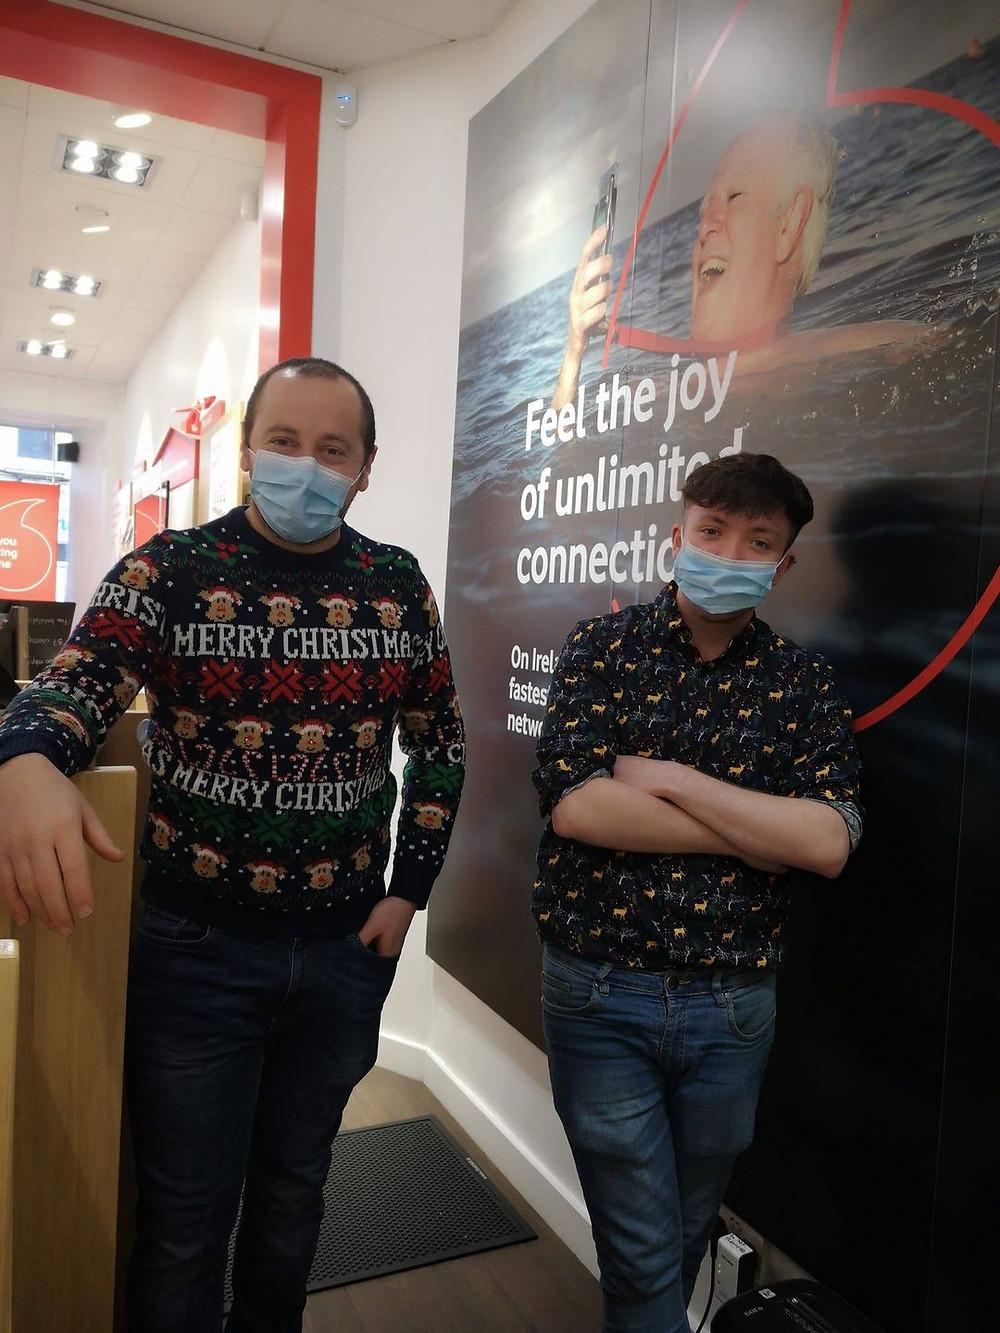 The Boys in Ballina Feeling the Christmas Cheer!